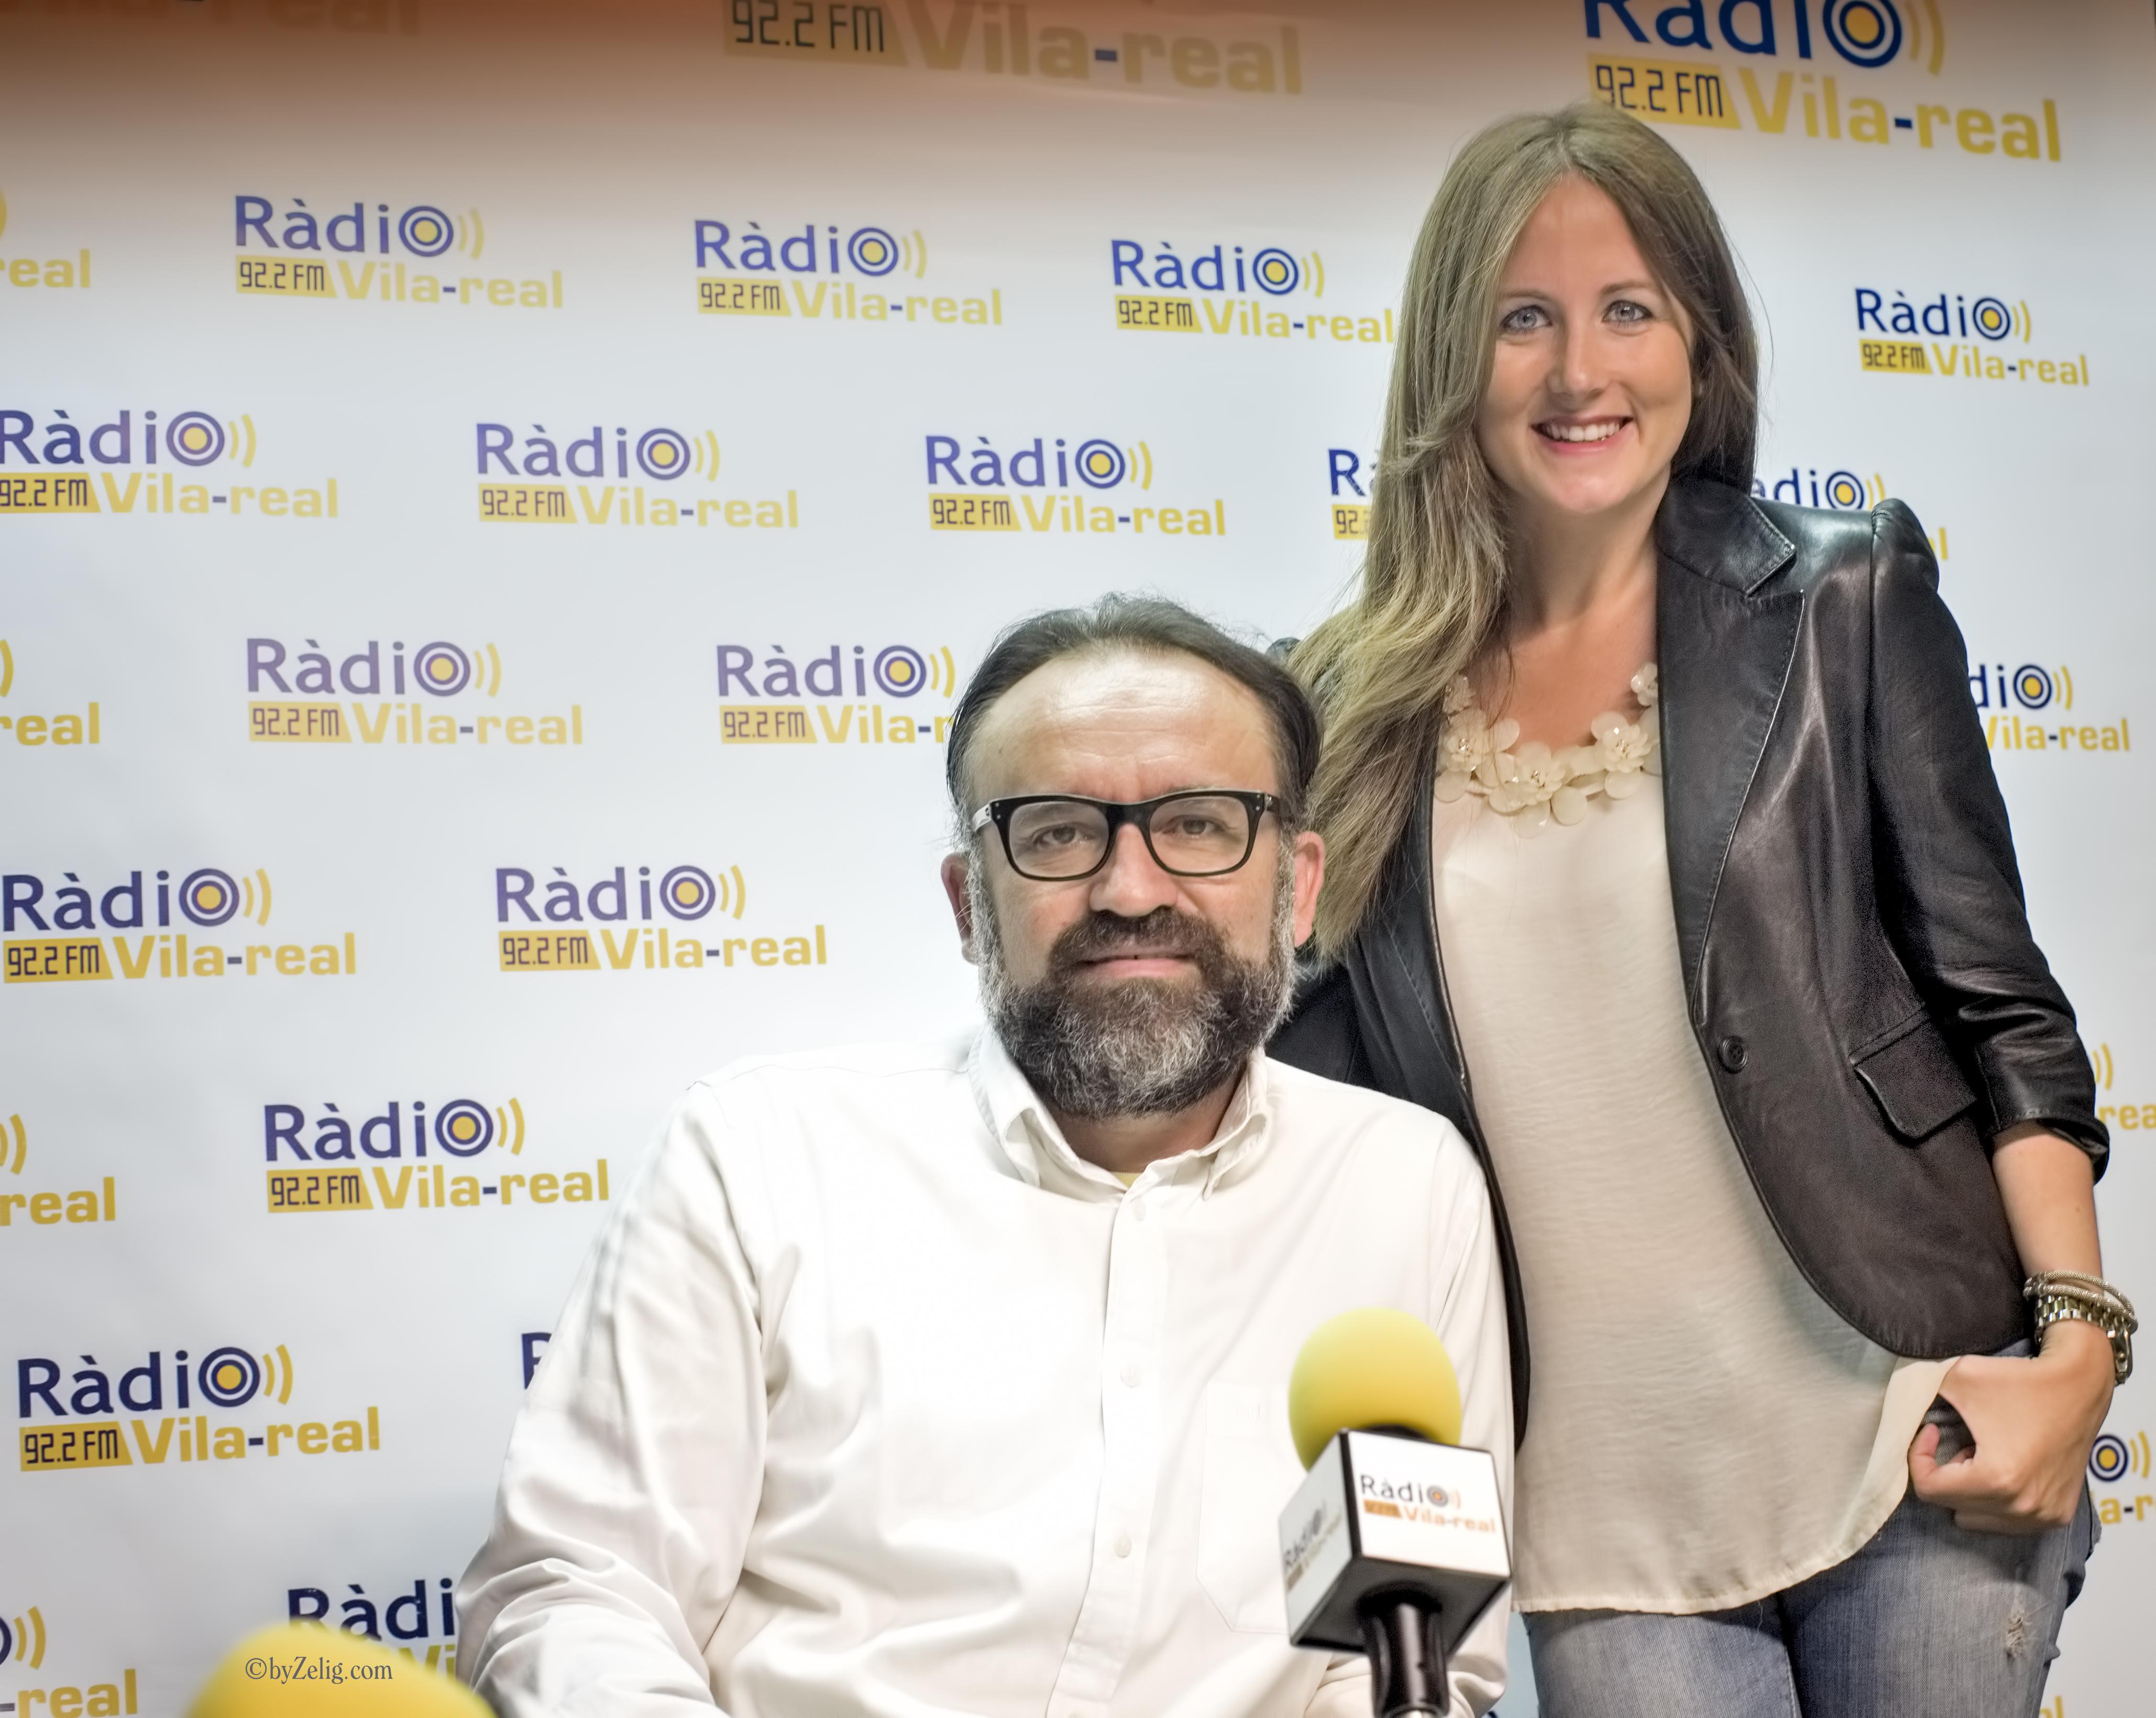 Esports Radio Vila-real. Programa del 5 de octubre 2017